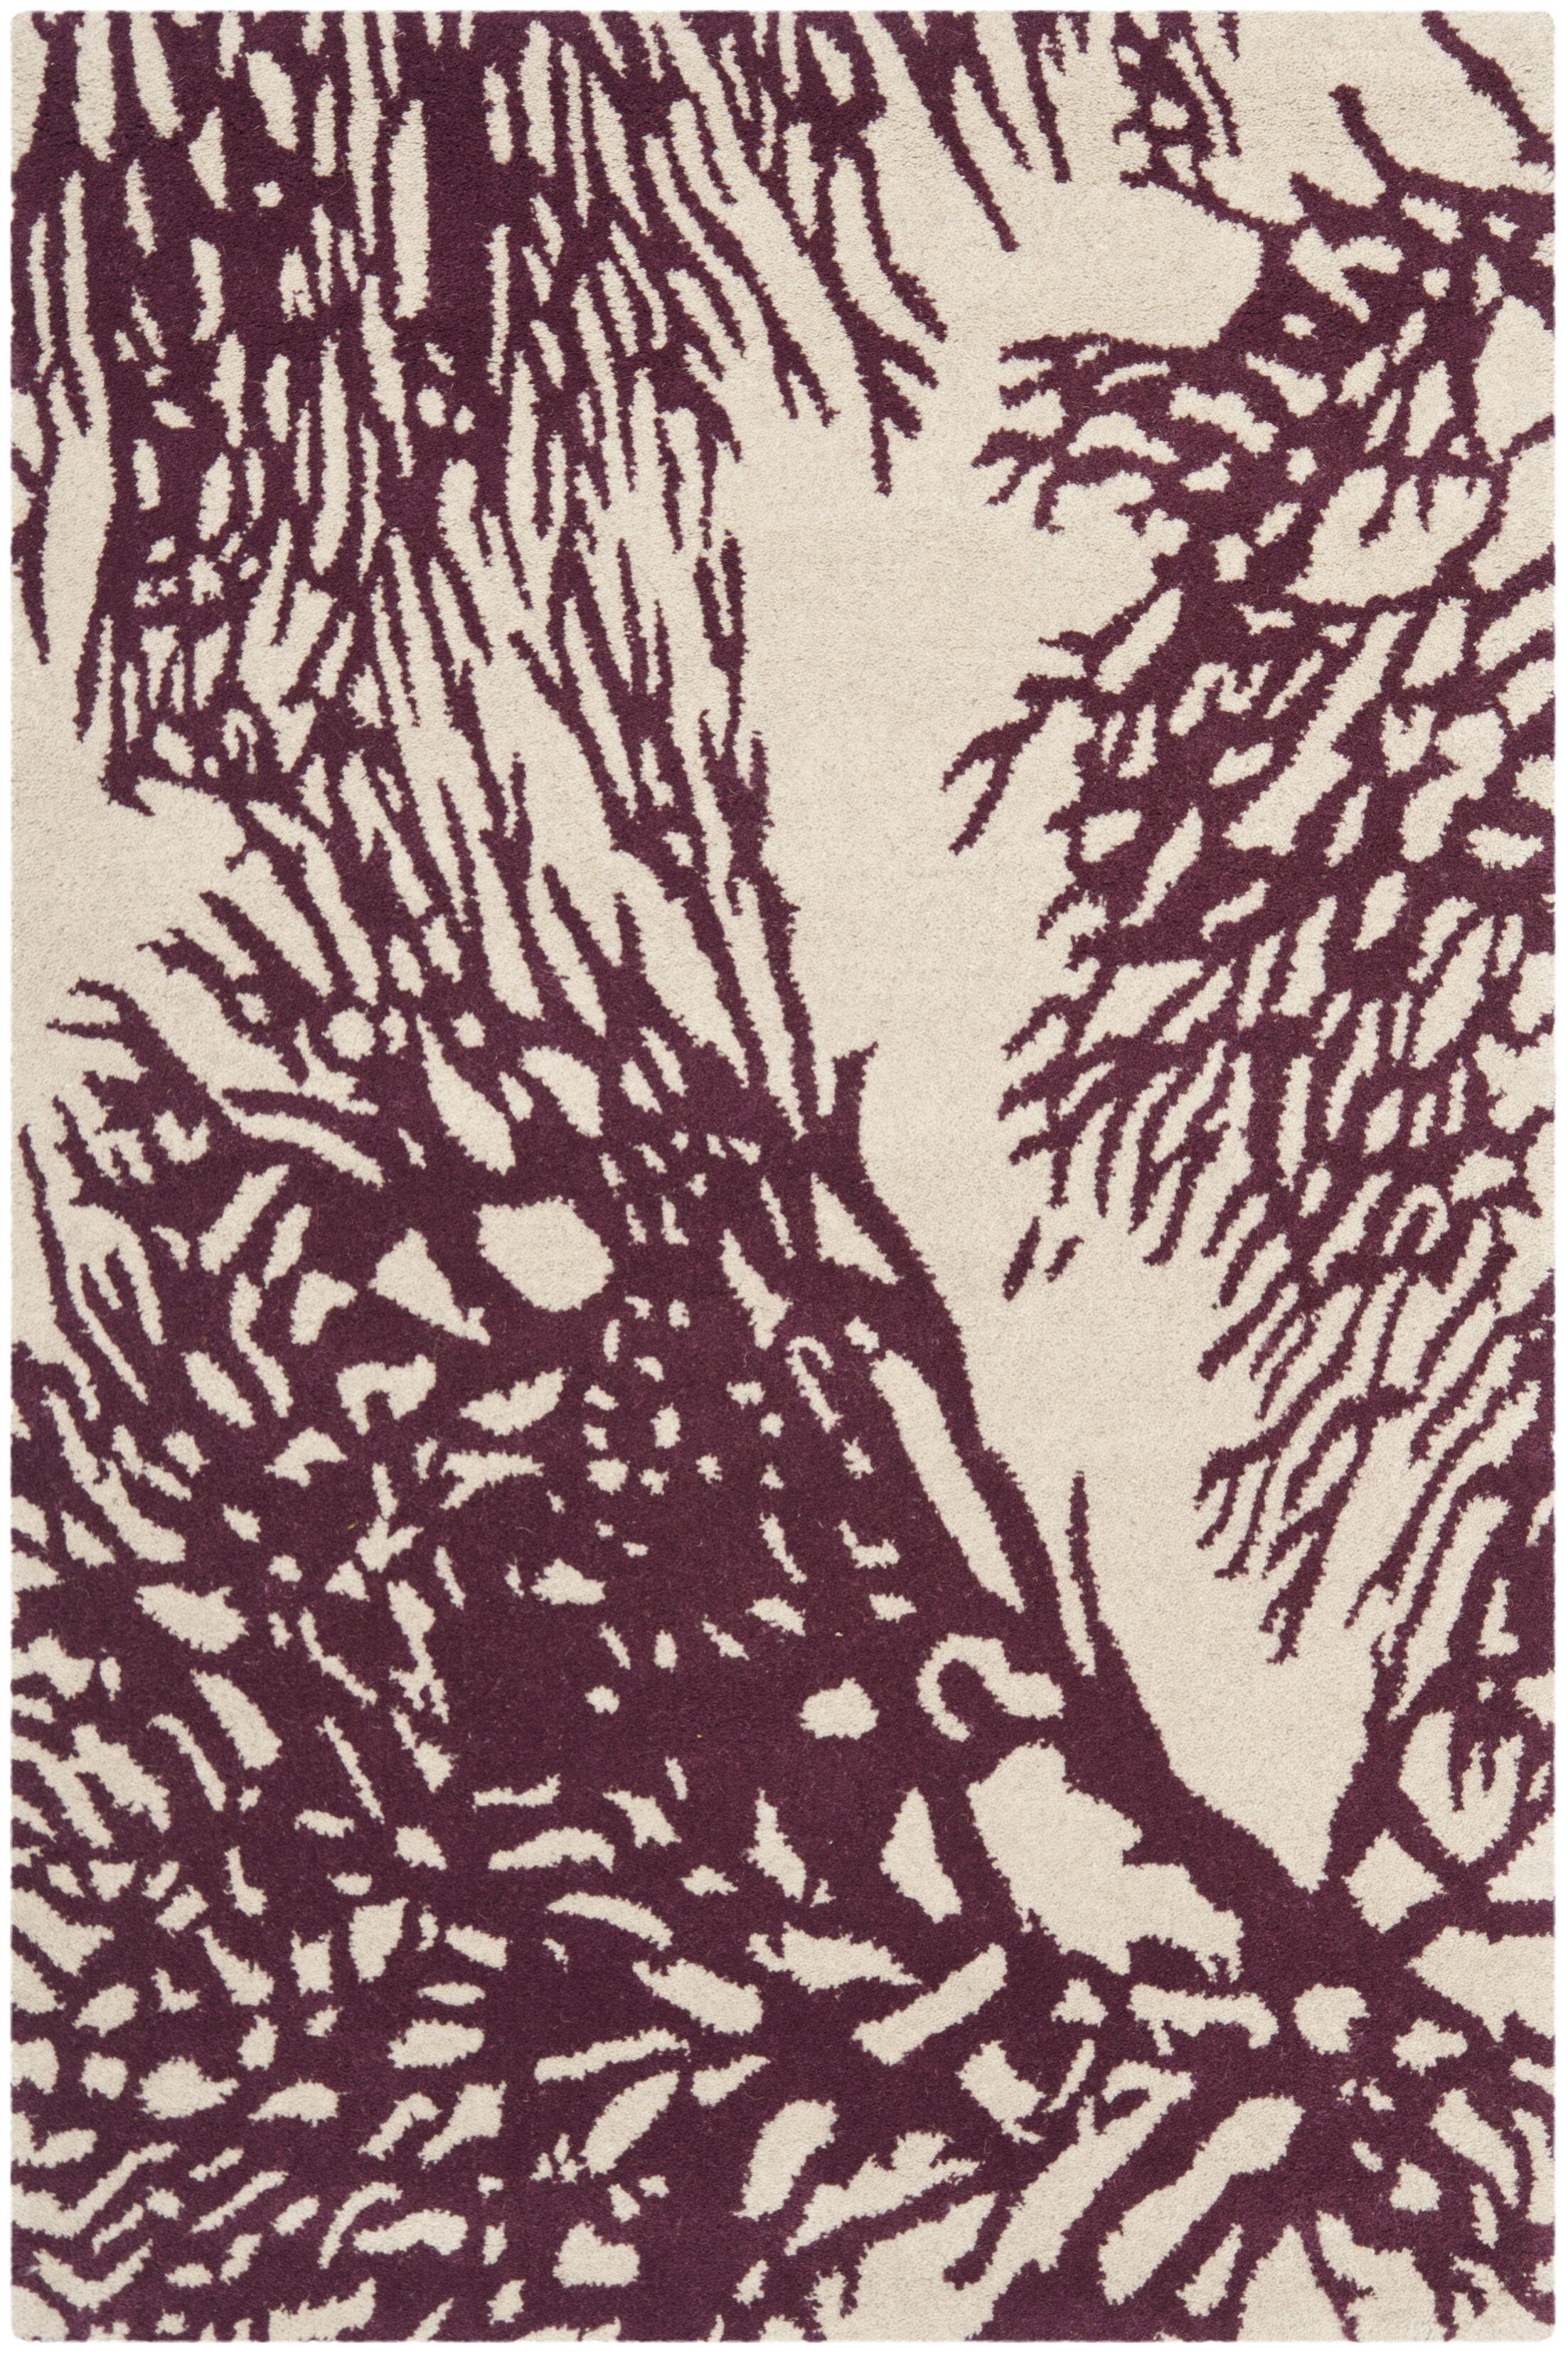 Juniper Hand-Tufted Beige/Purple Area Rug Rug Size: Square 5'